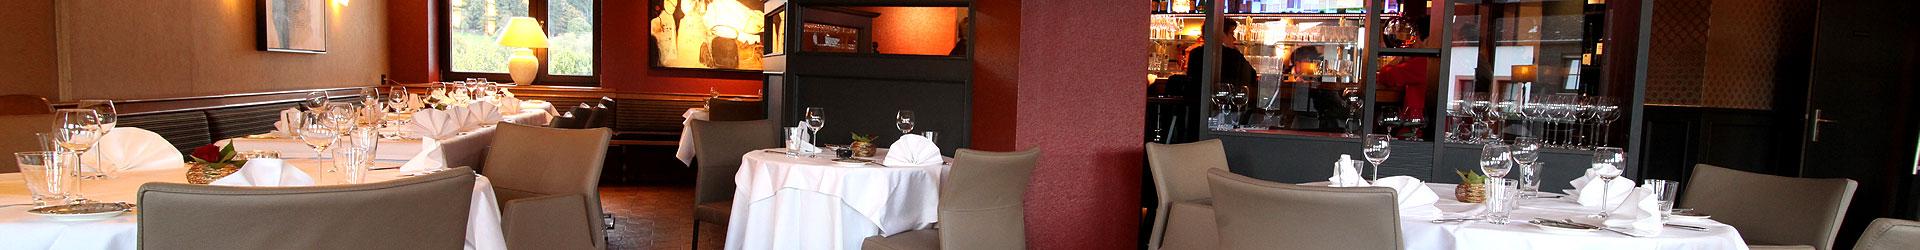 Headerbild-Restaurant4